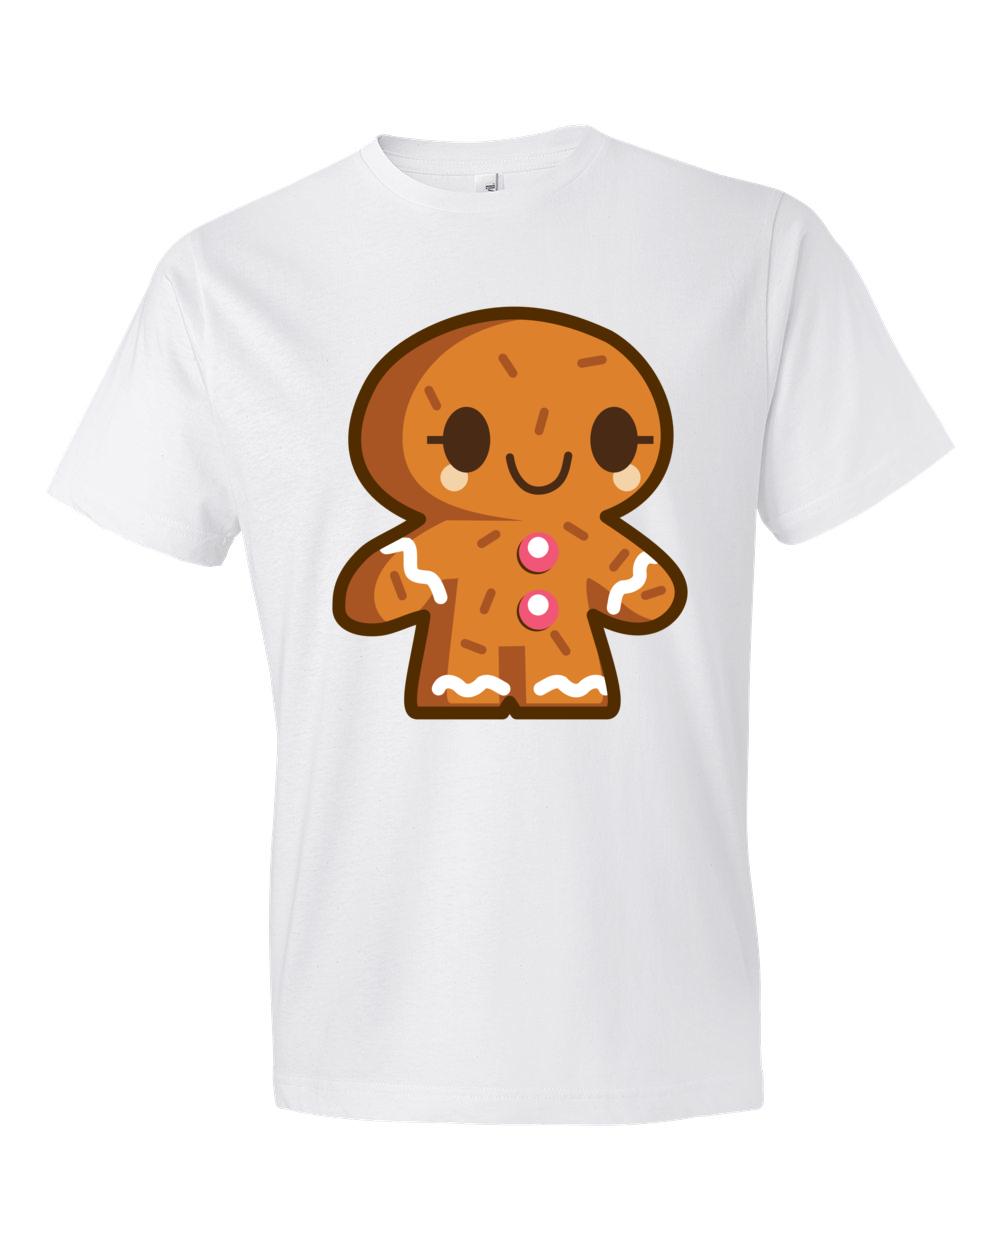 Gingerman-Lightweight-Fashion-Short-Sleeve-T-Shirt-by-iTEE.com